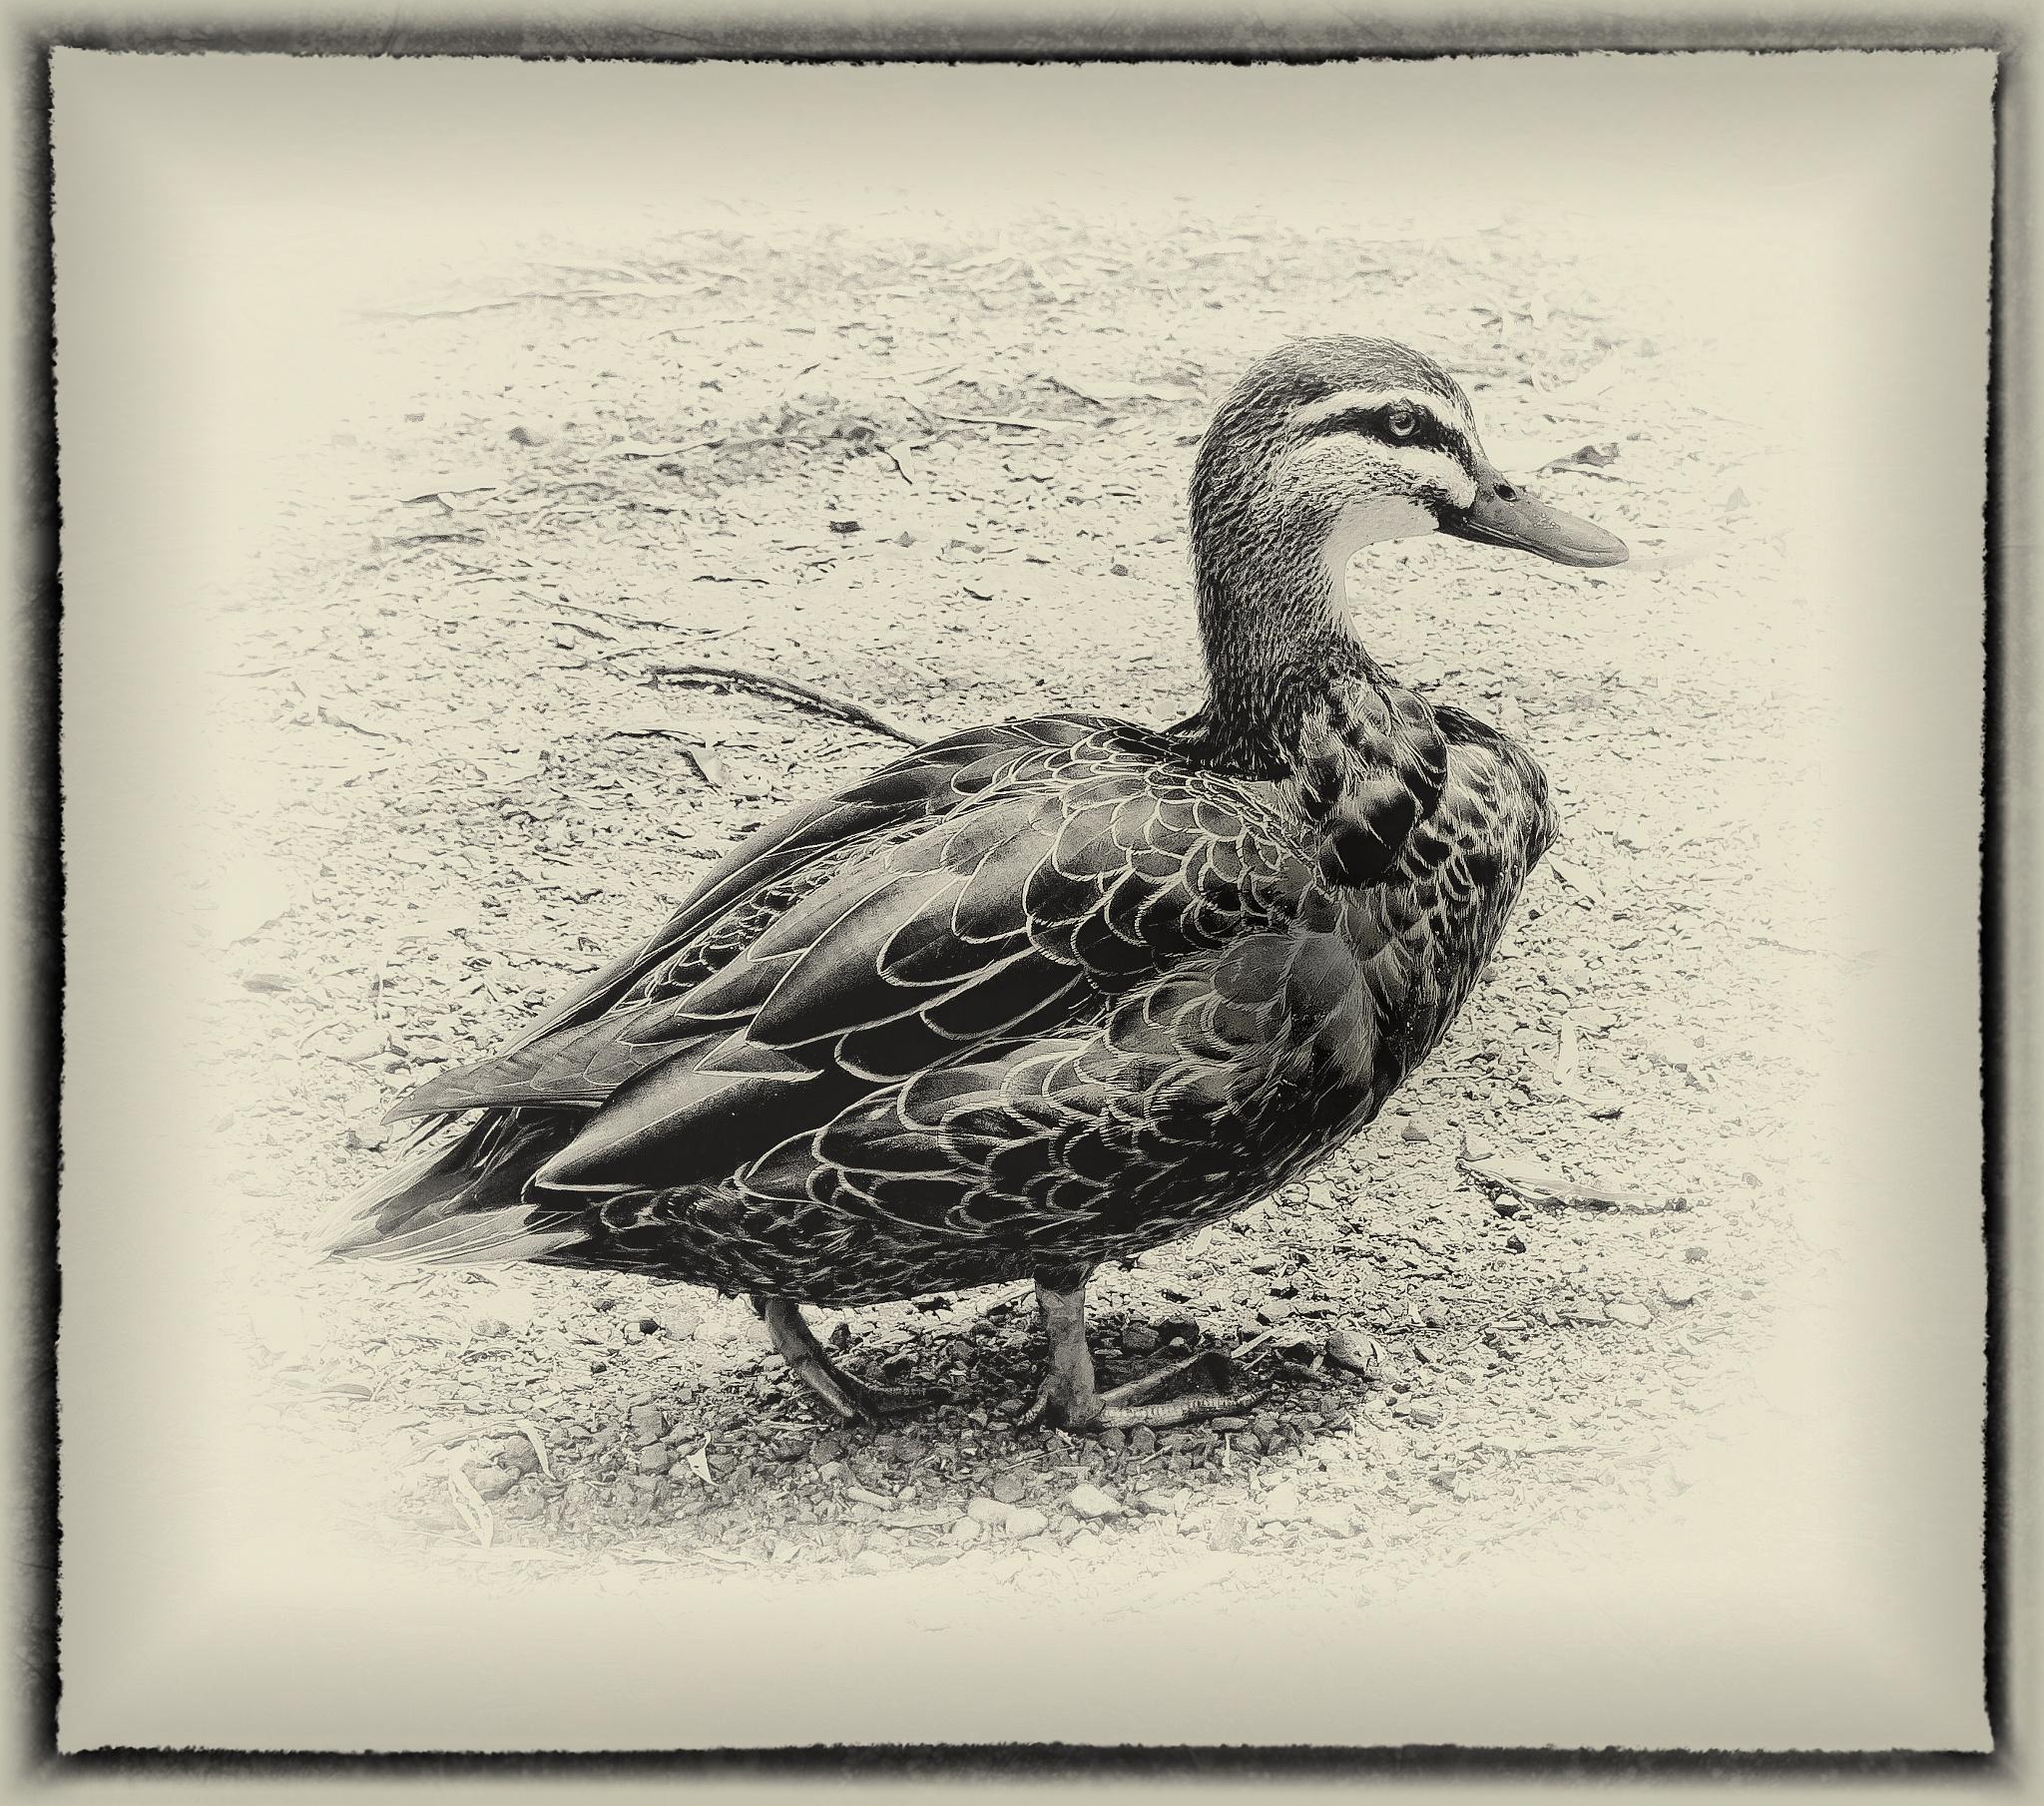 Wood Duck by LyndaRealmshift